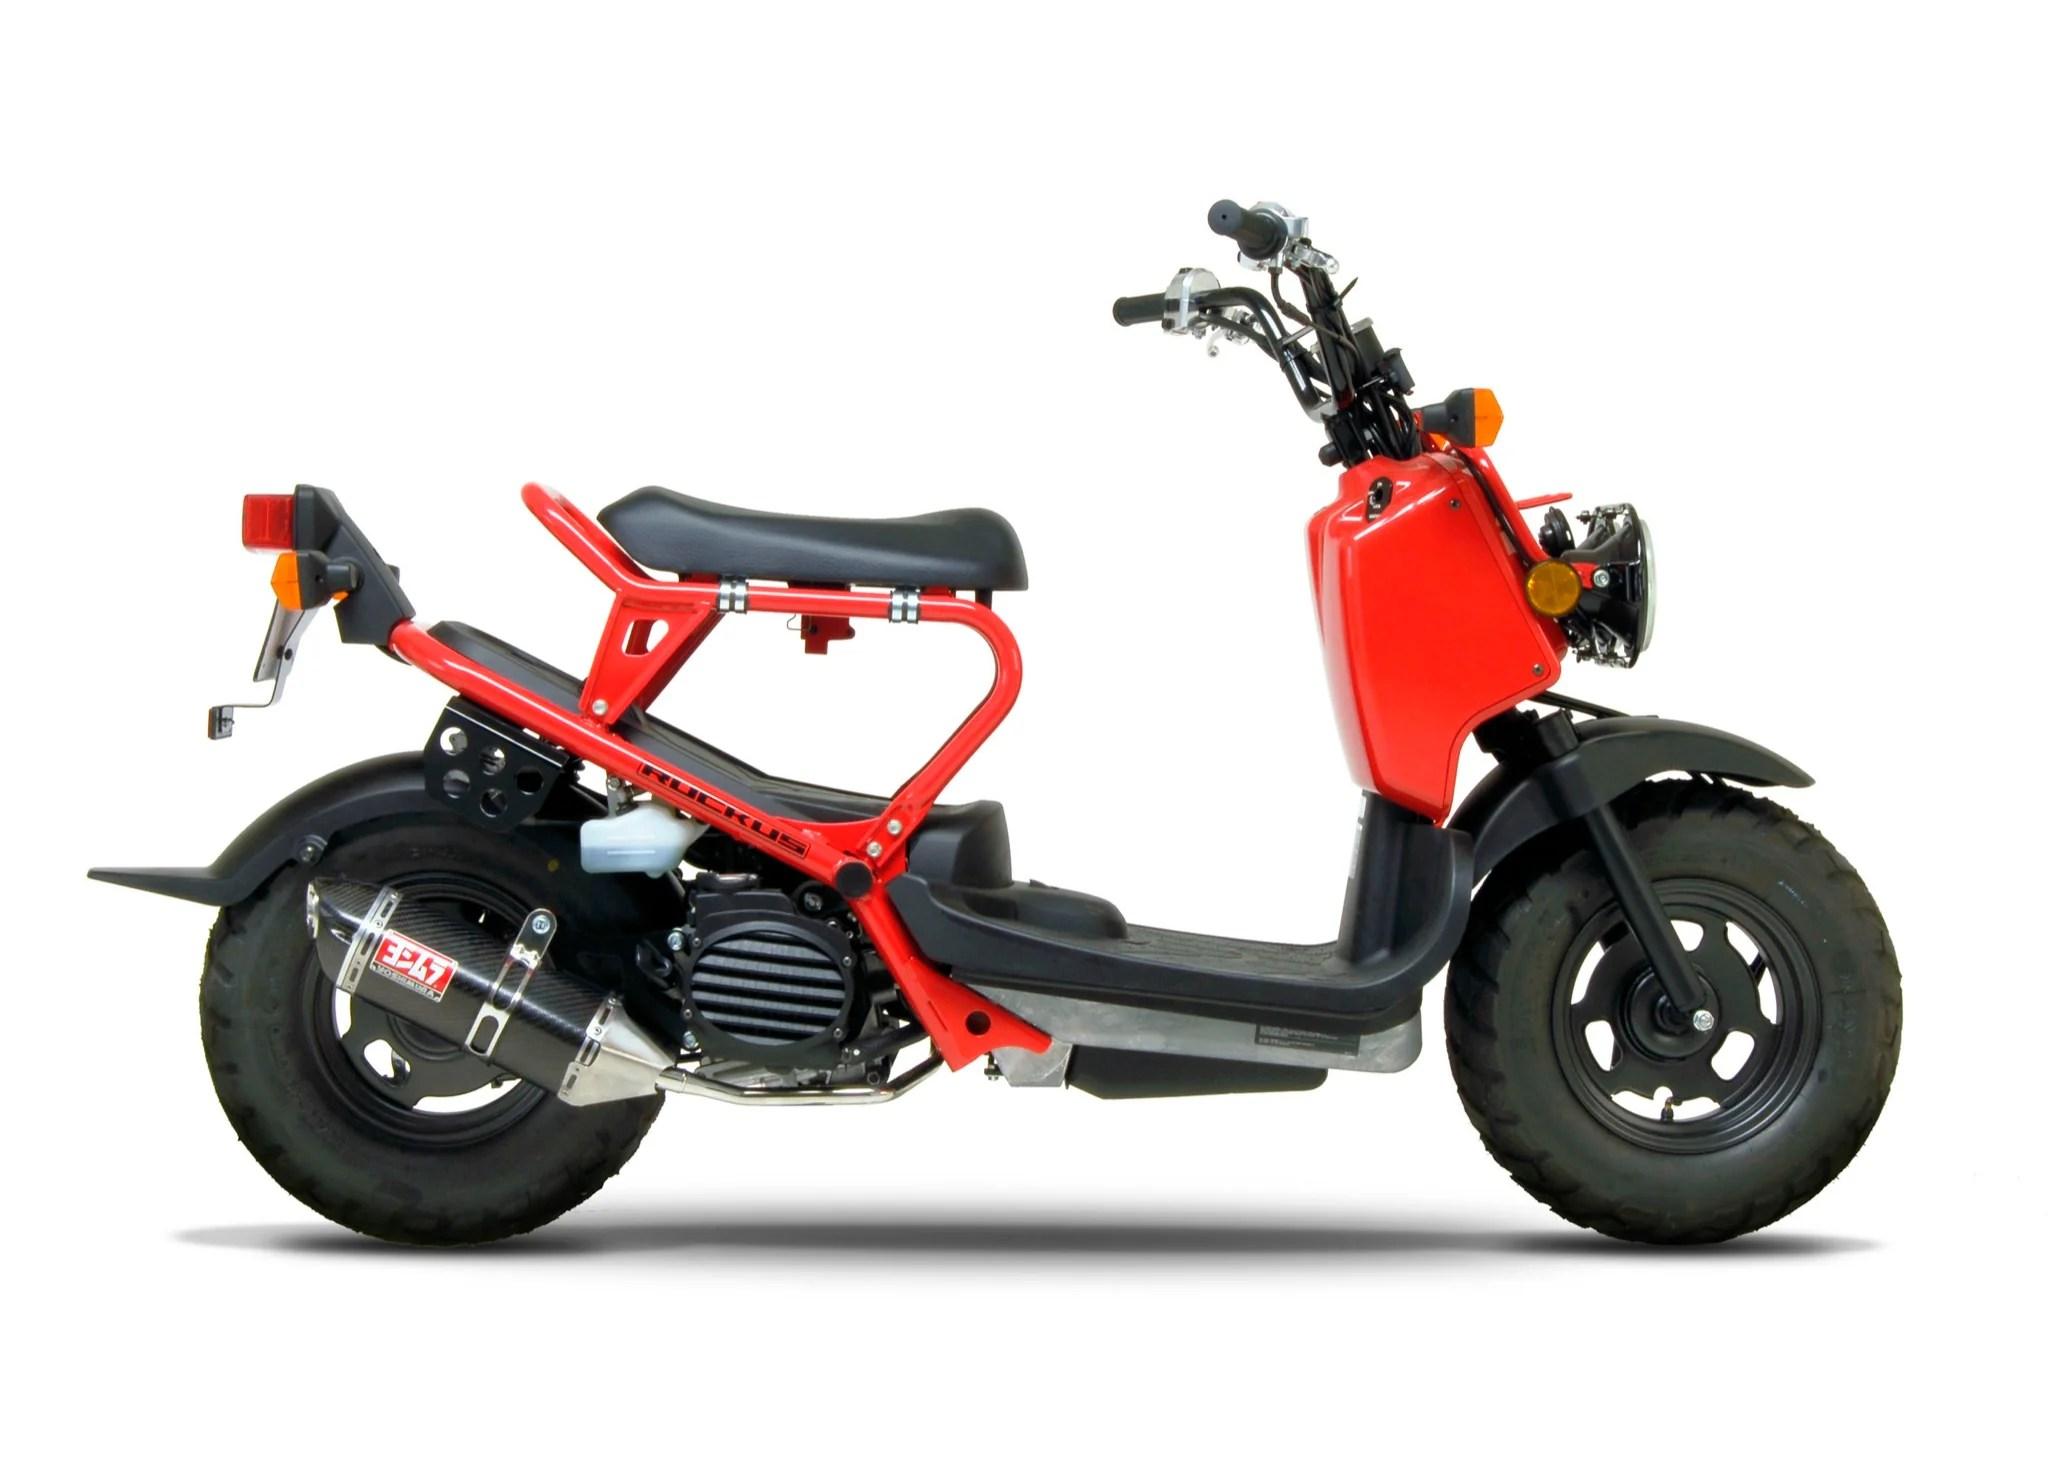 ruckus zoomer 03 20 race trc stainless full exhaust w carbon fiber muffler